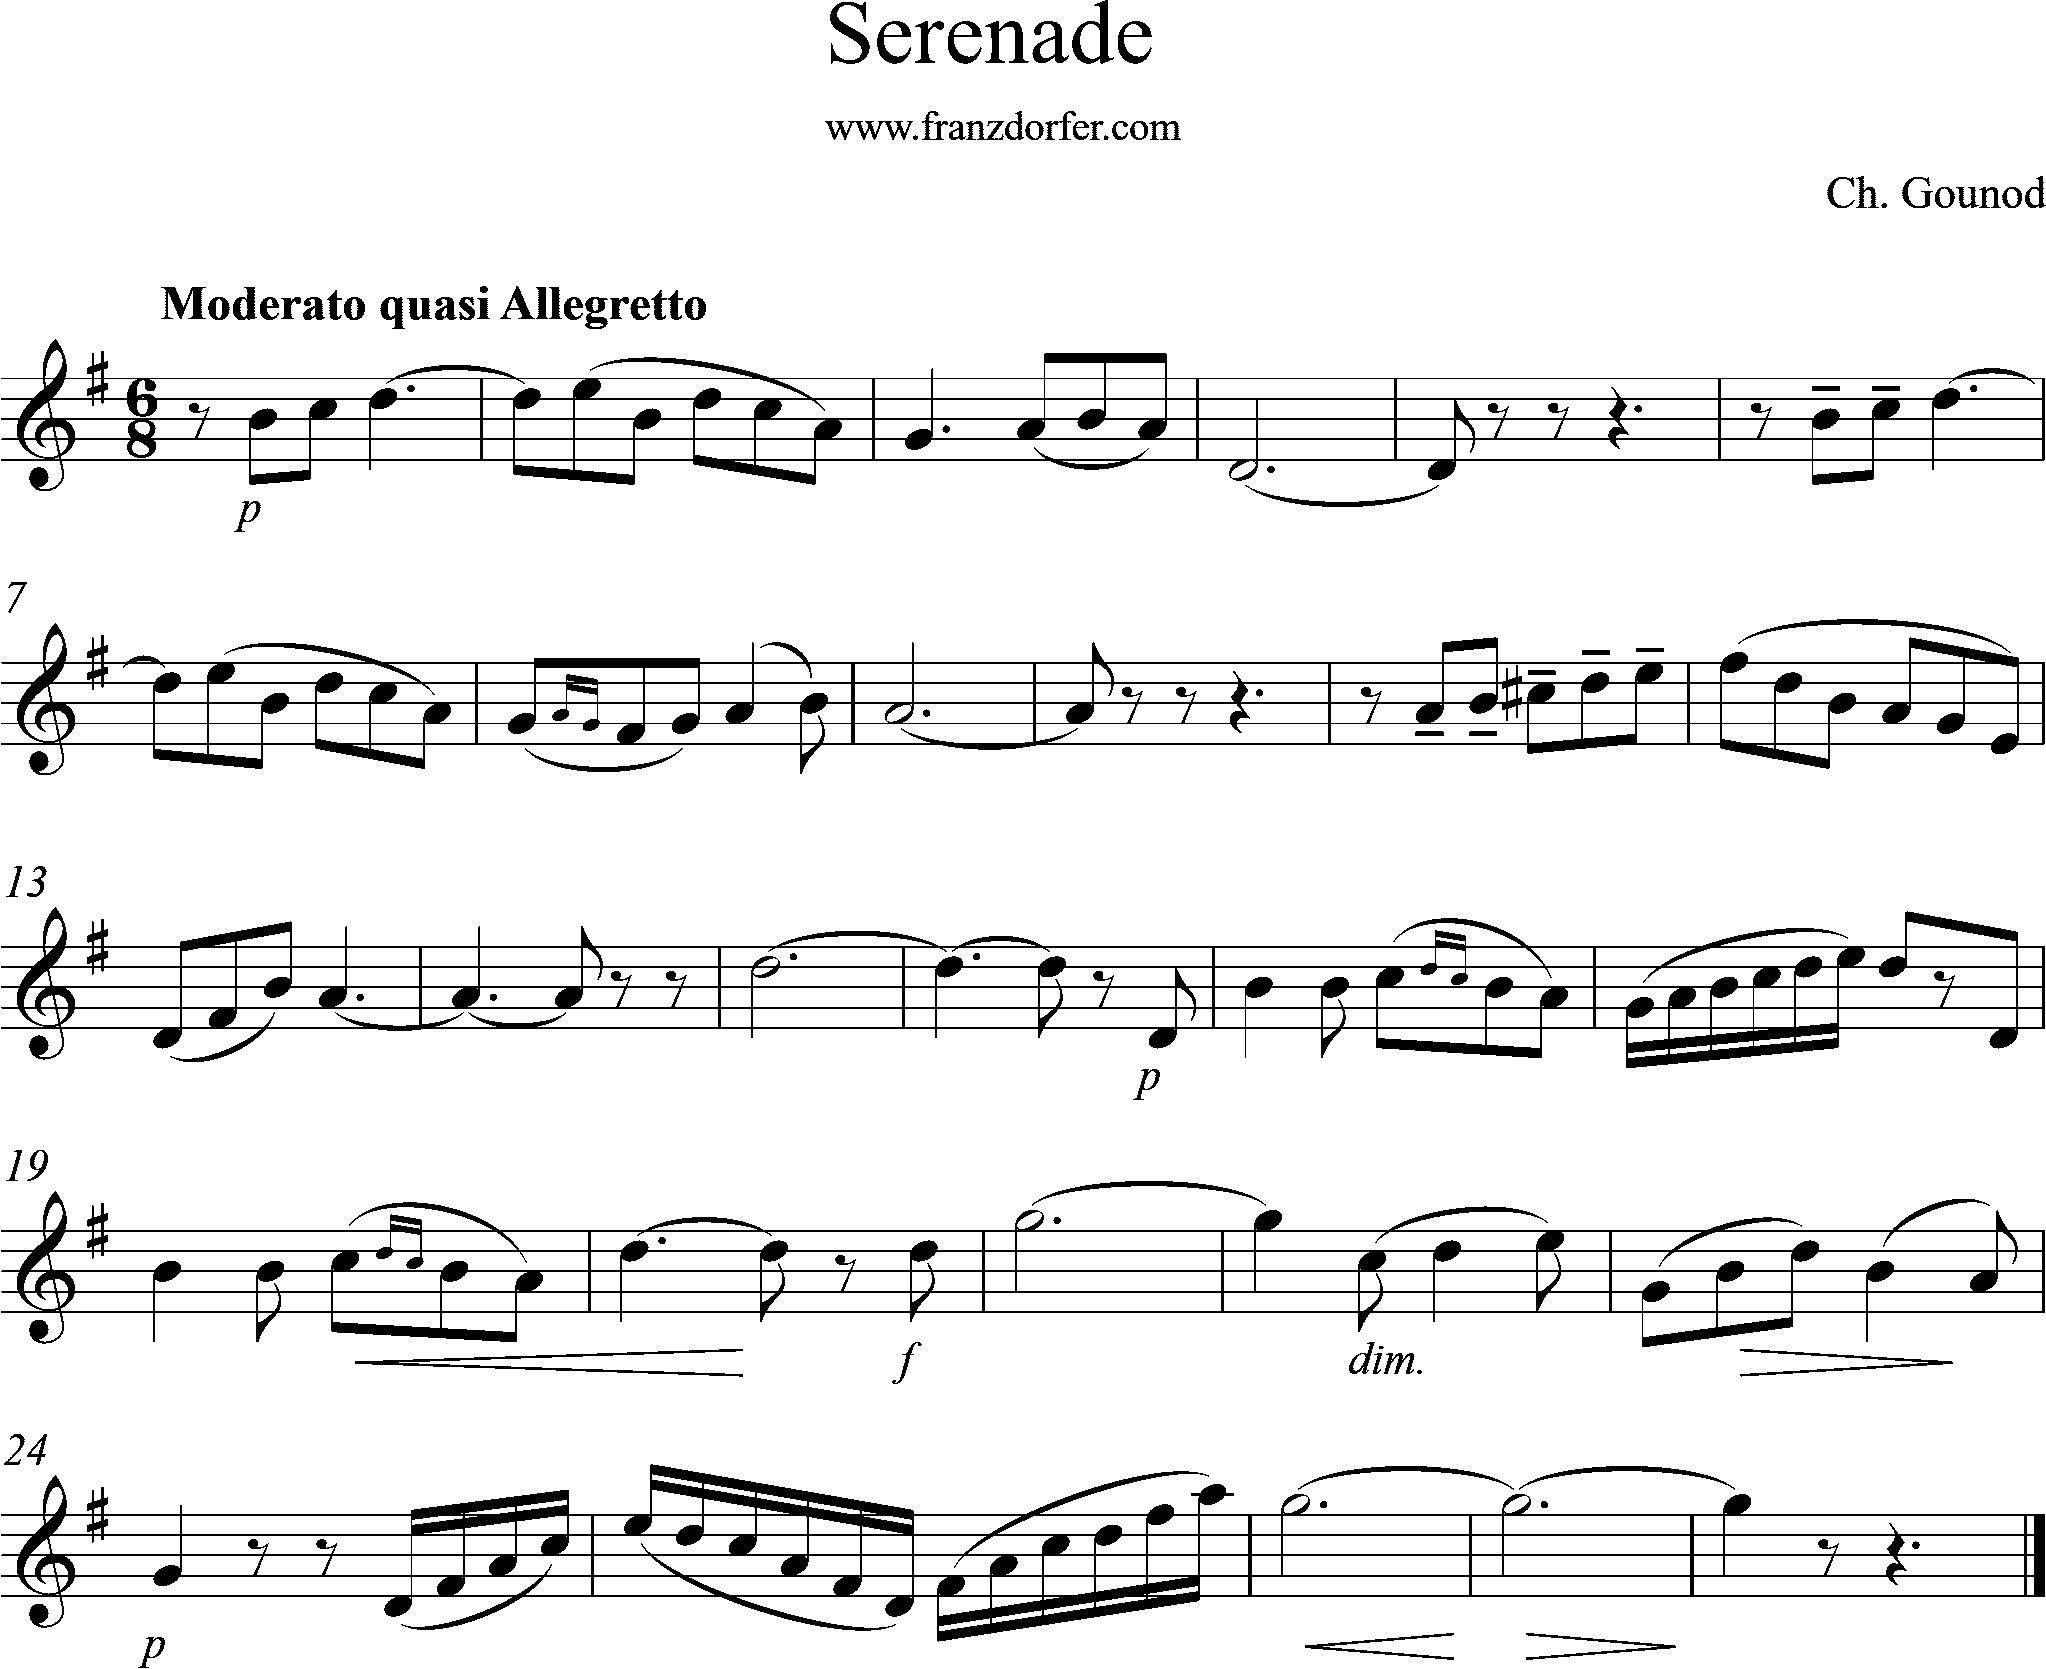 sheetmusic Serenade. Gounod, G-Major